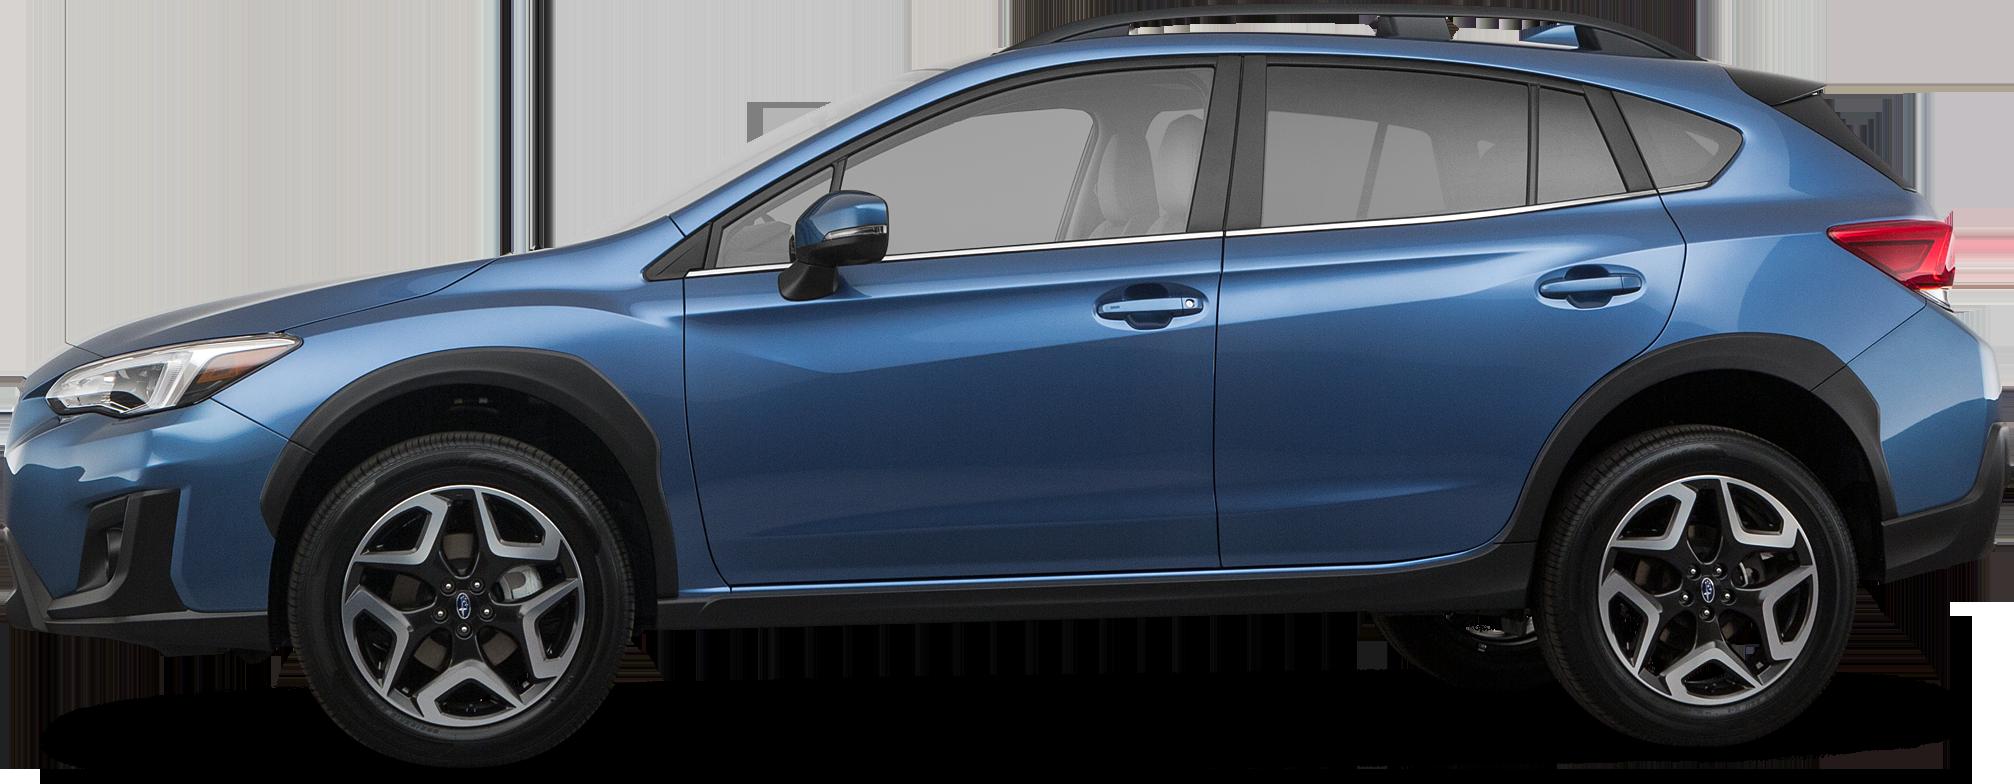 2020 Subaru Crosstrek SUV Limited